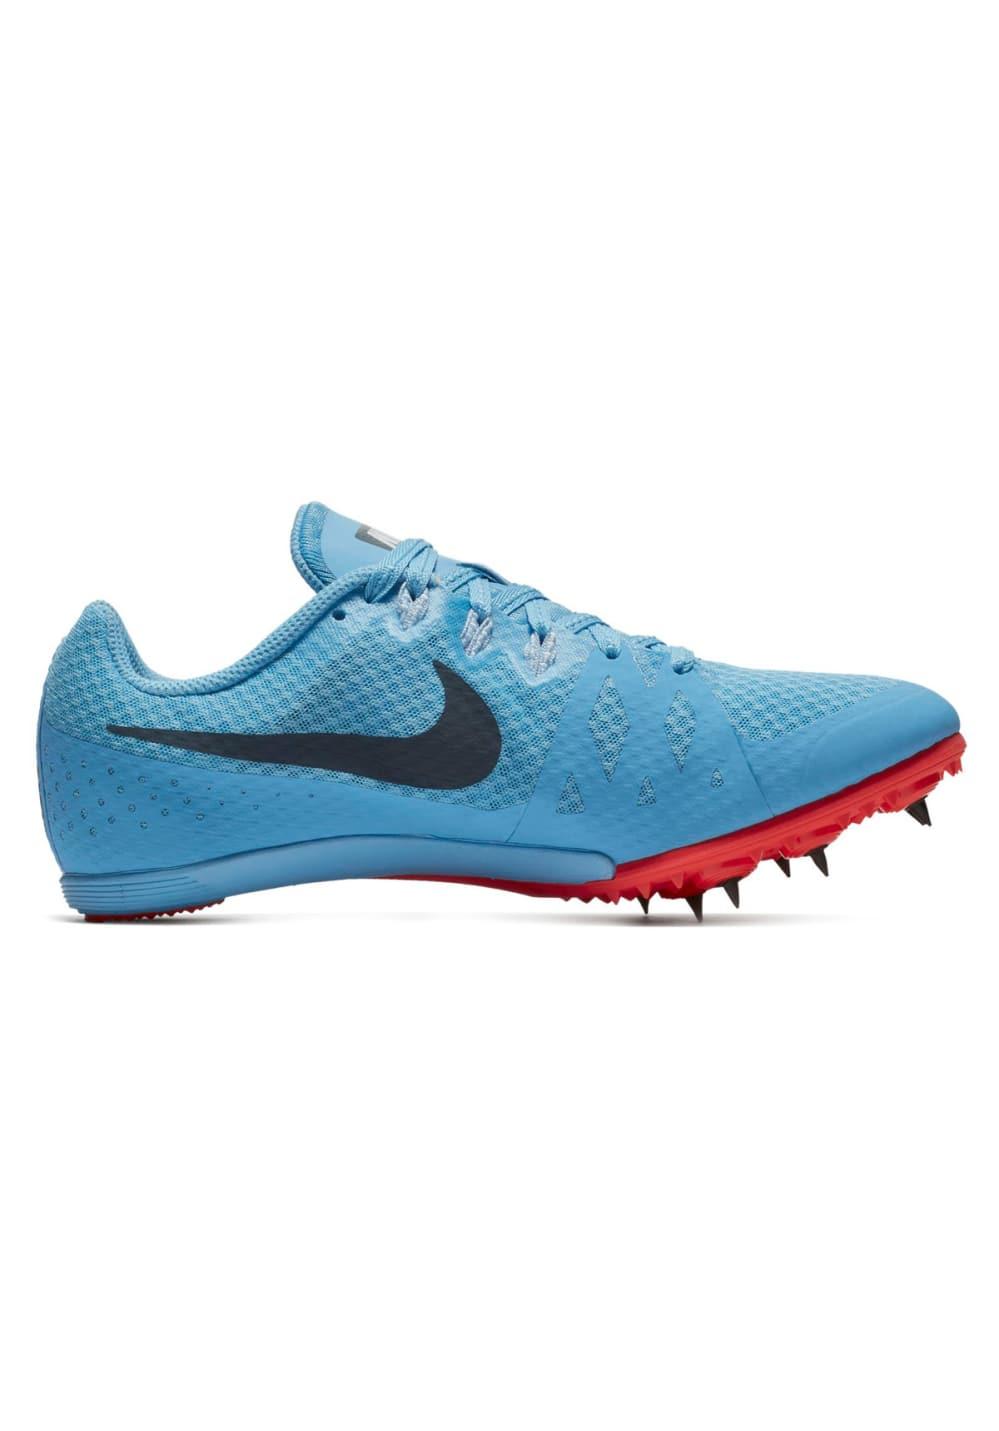 Nike Zoom Rival MD 8 Track Spike - Spikes für Damen - Blau